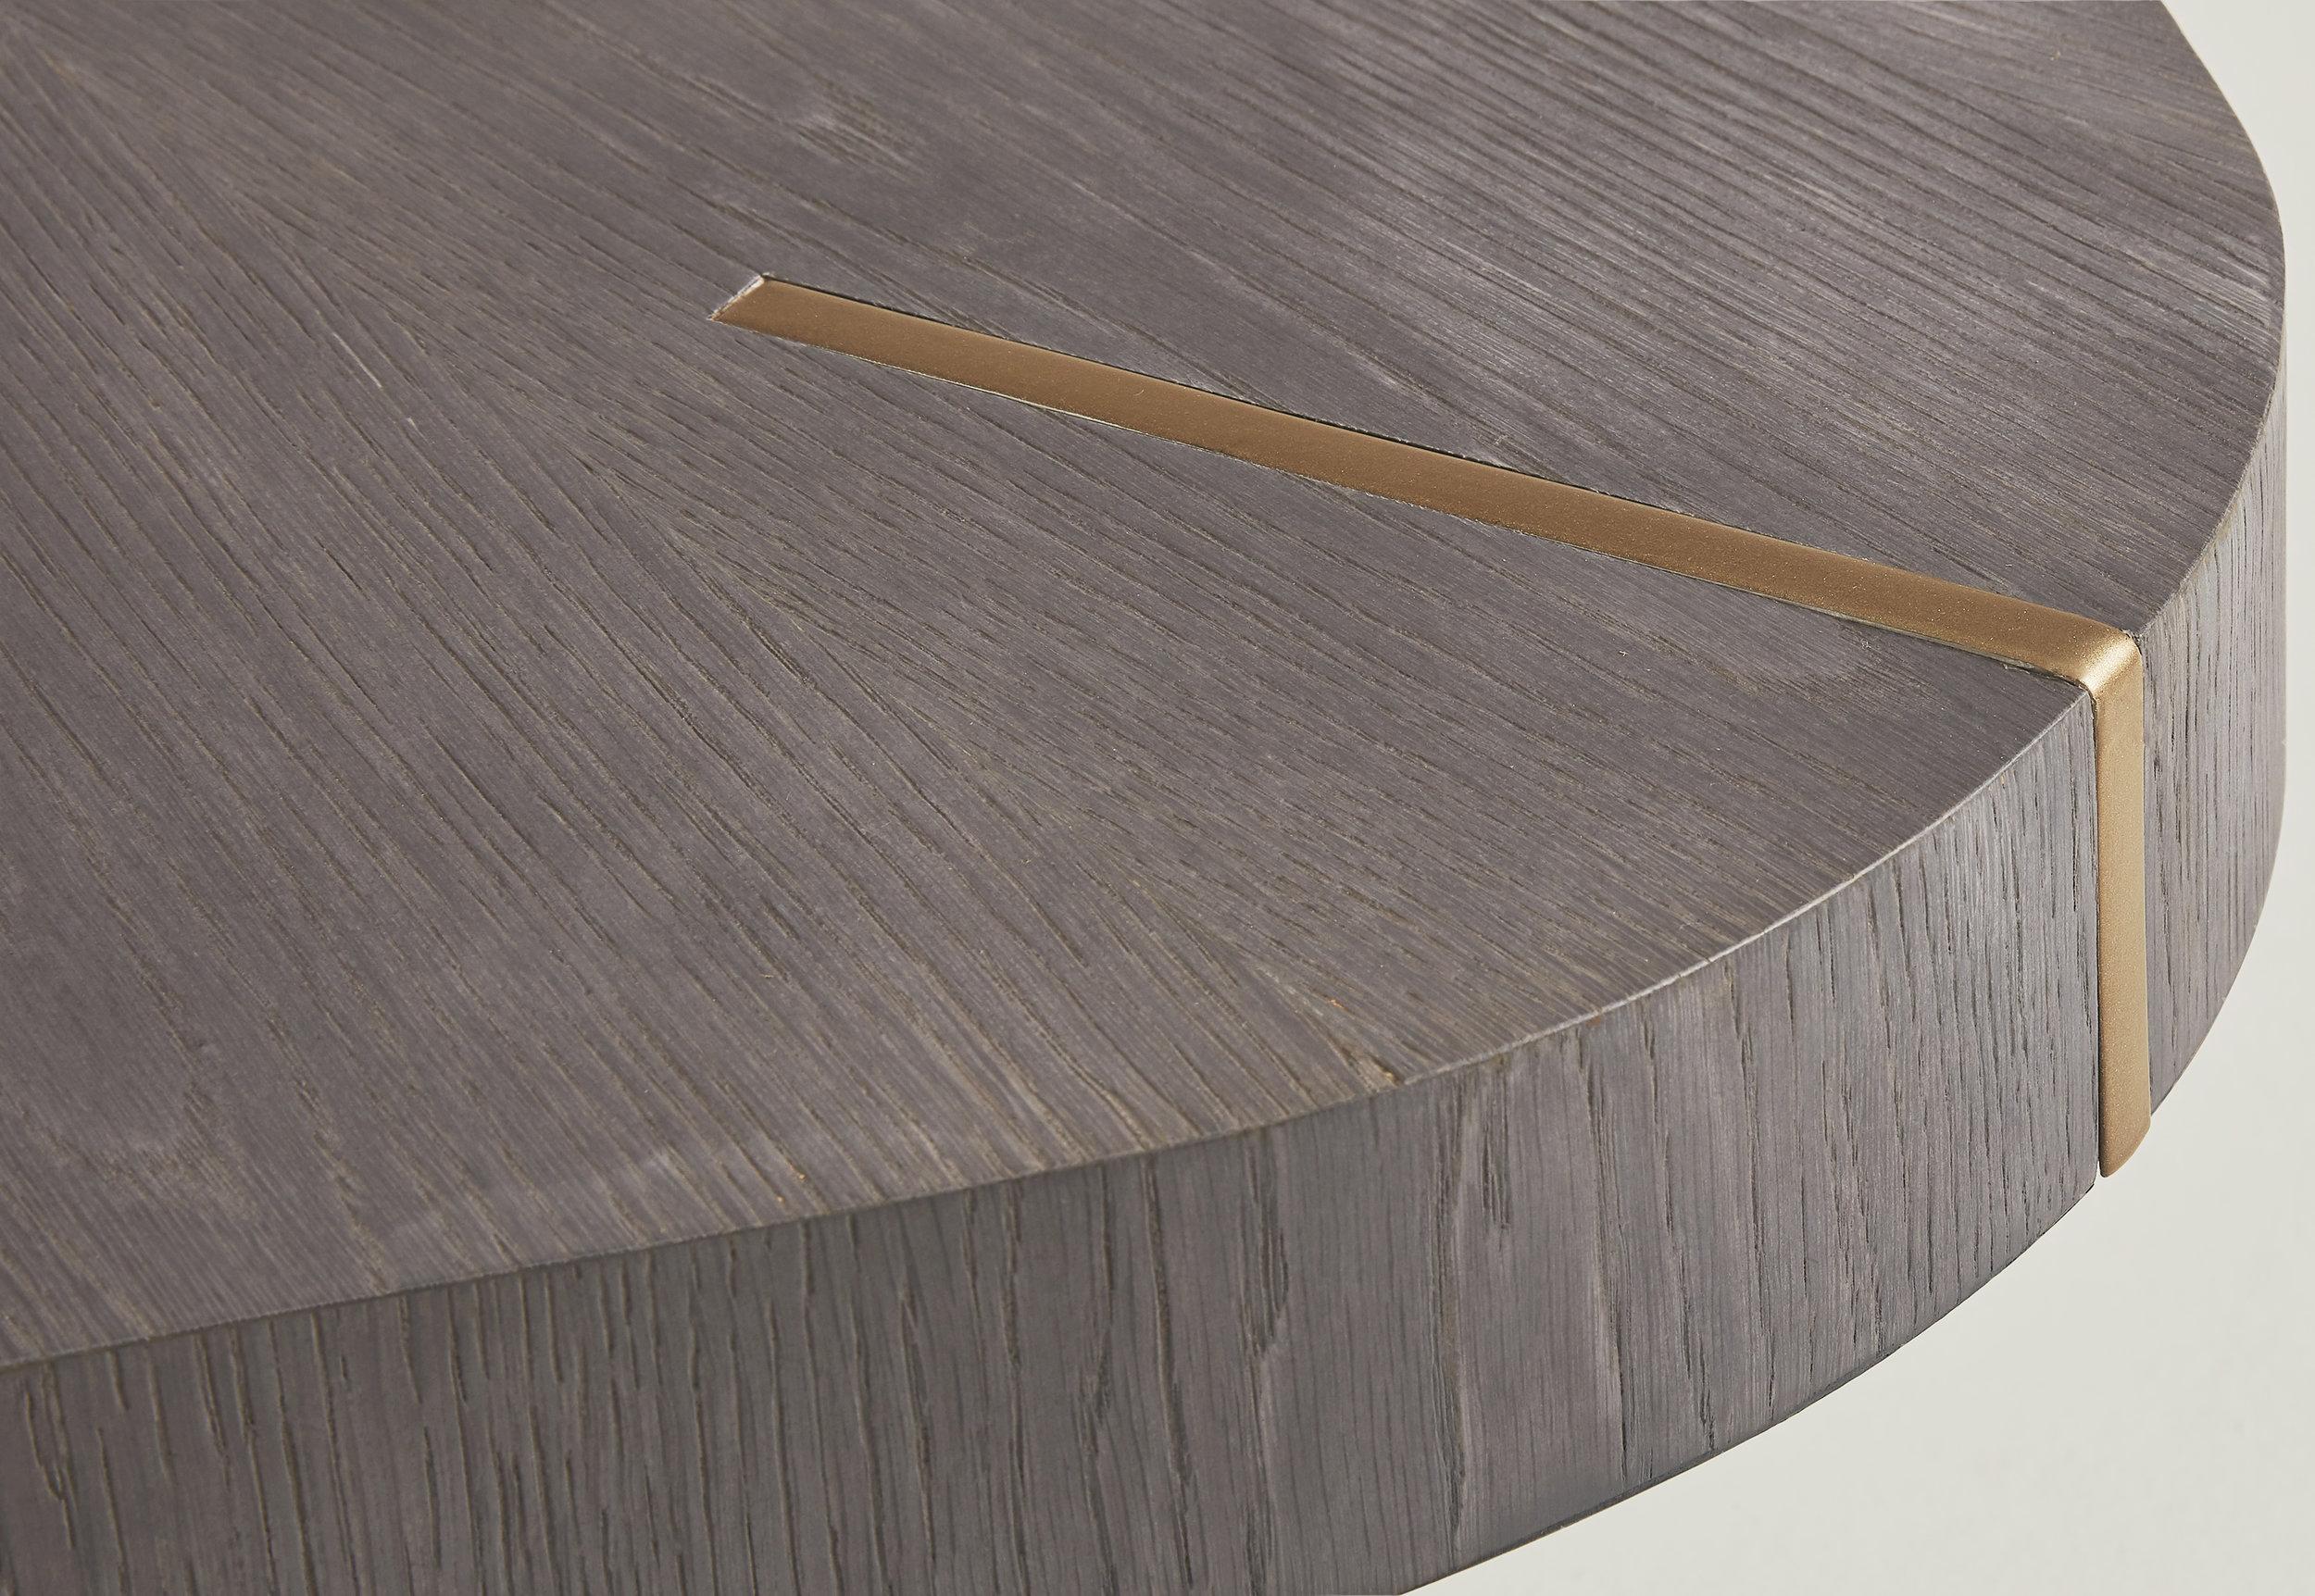 Bordeaux Dining table detail 2.jpg